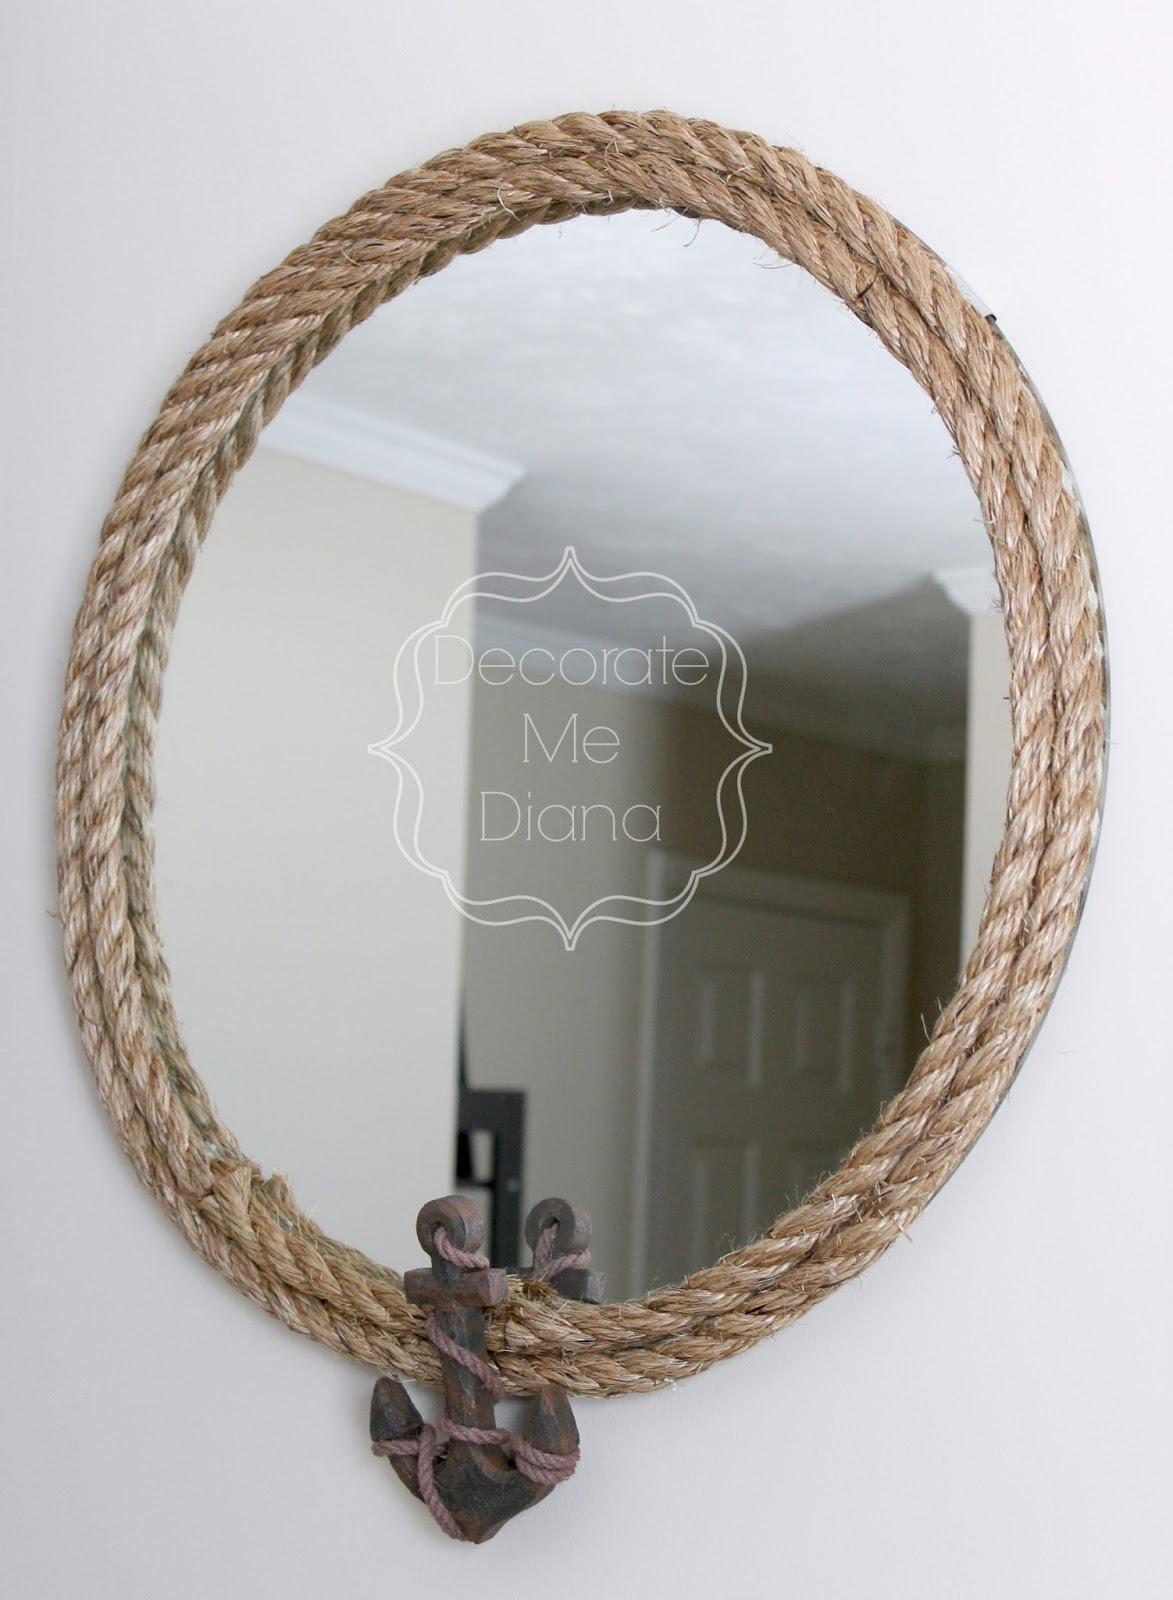 http://www.decoratemediana.com/2013/10/diy-nautical-mirror.html